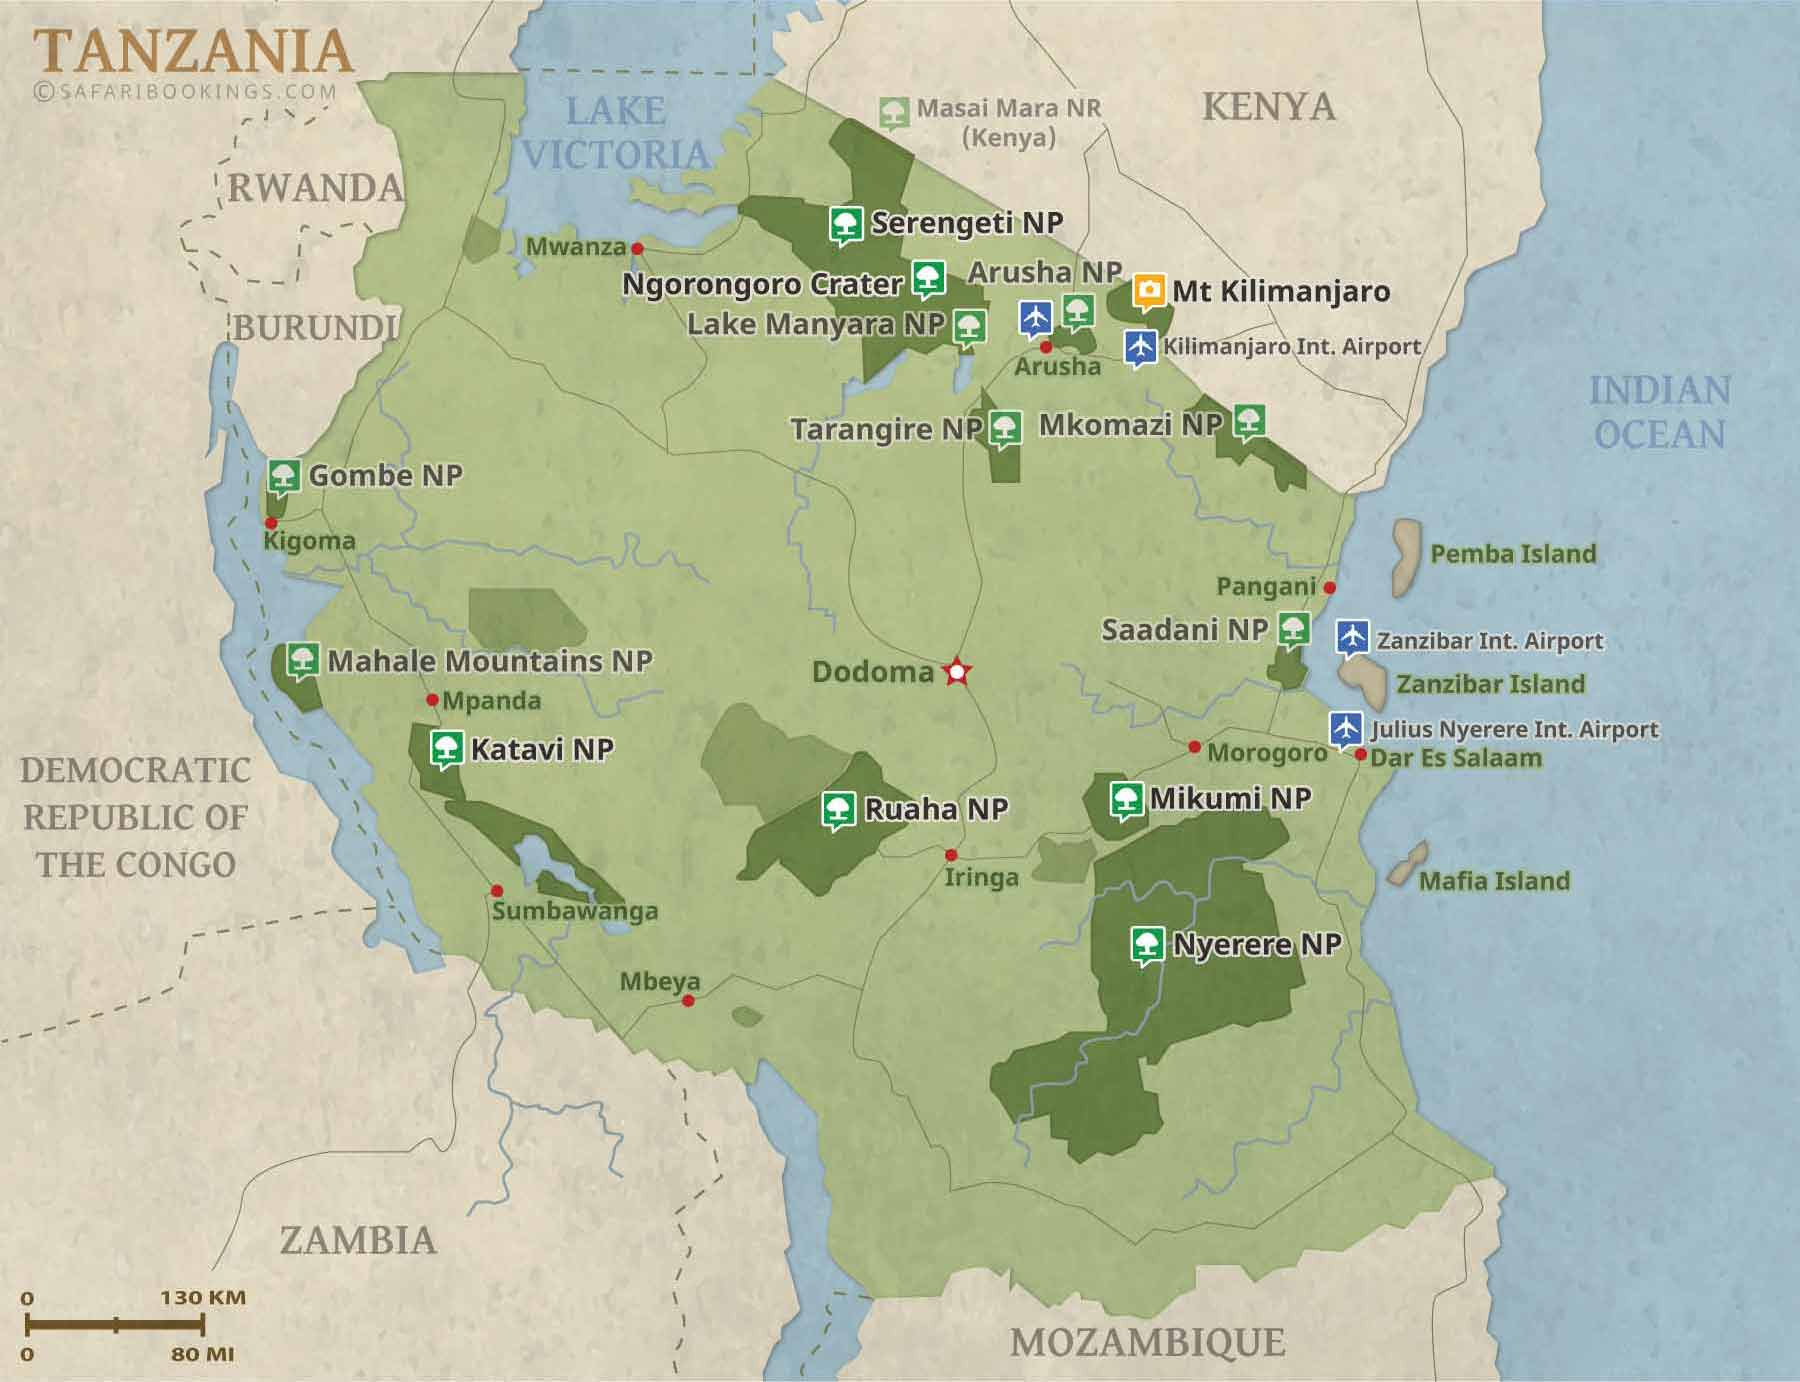 Popular Routes in Tanzania